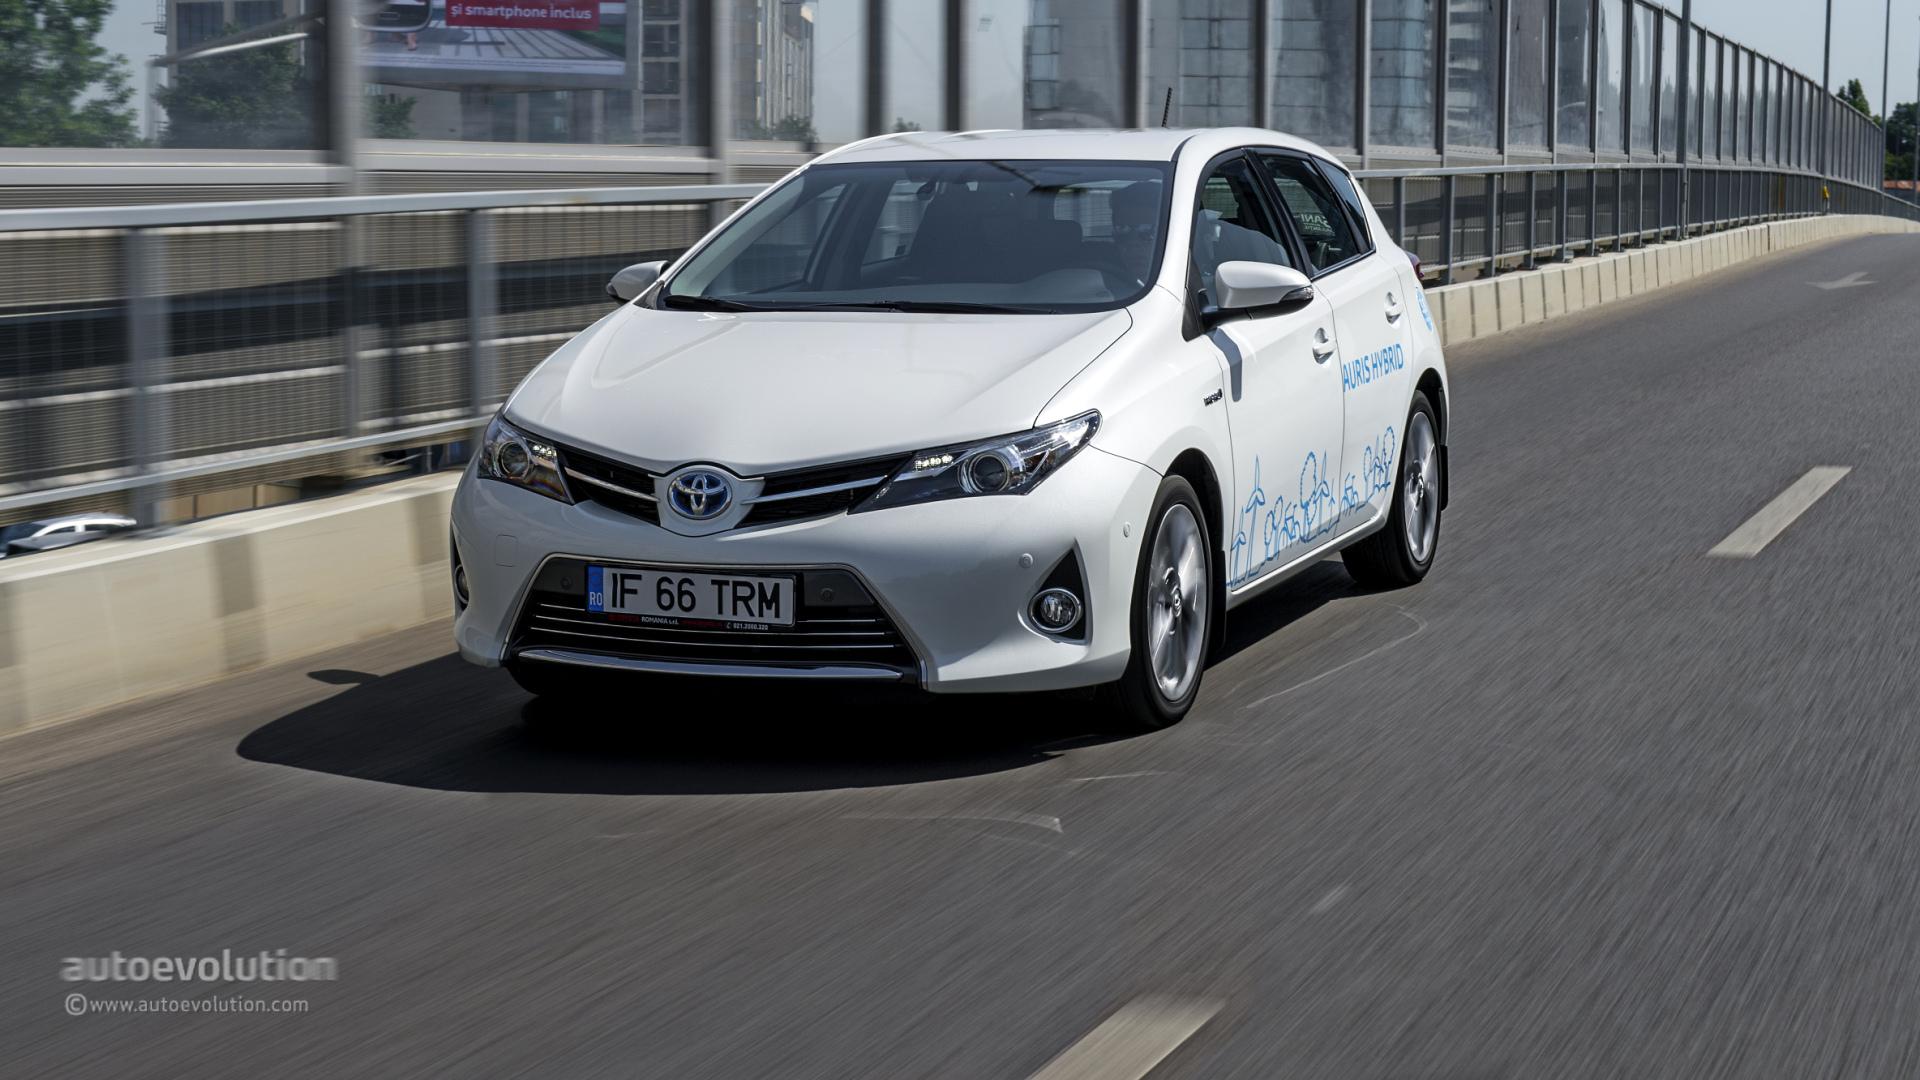 Toyota Auris Diesel 2016 >> TOYOTA Auris Hybrid Review - autoevolution